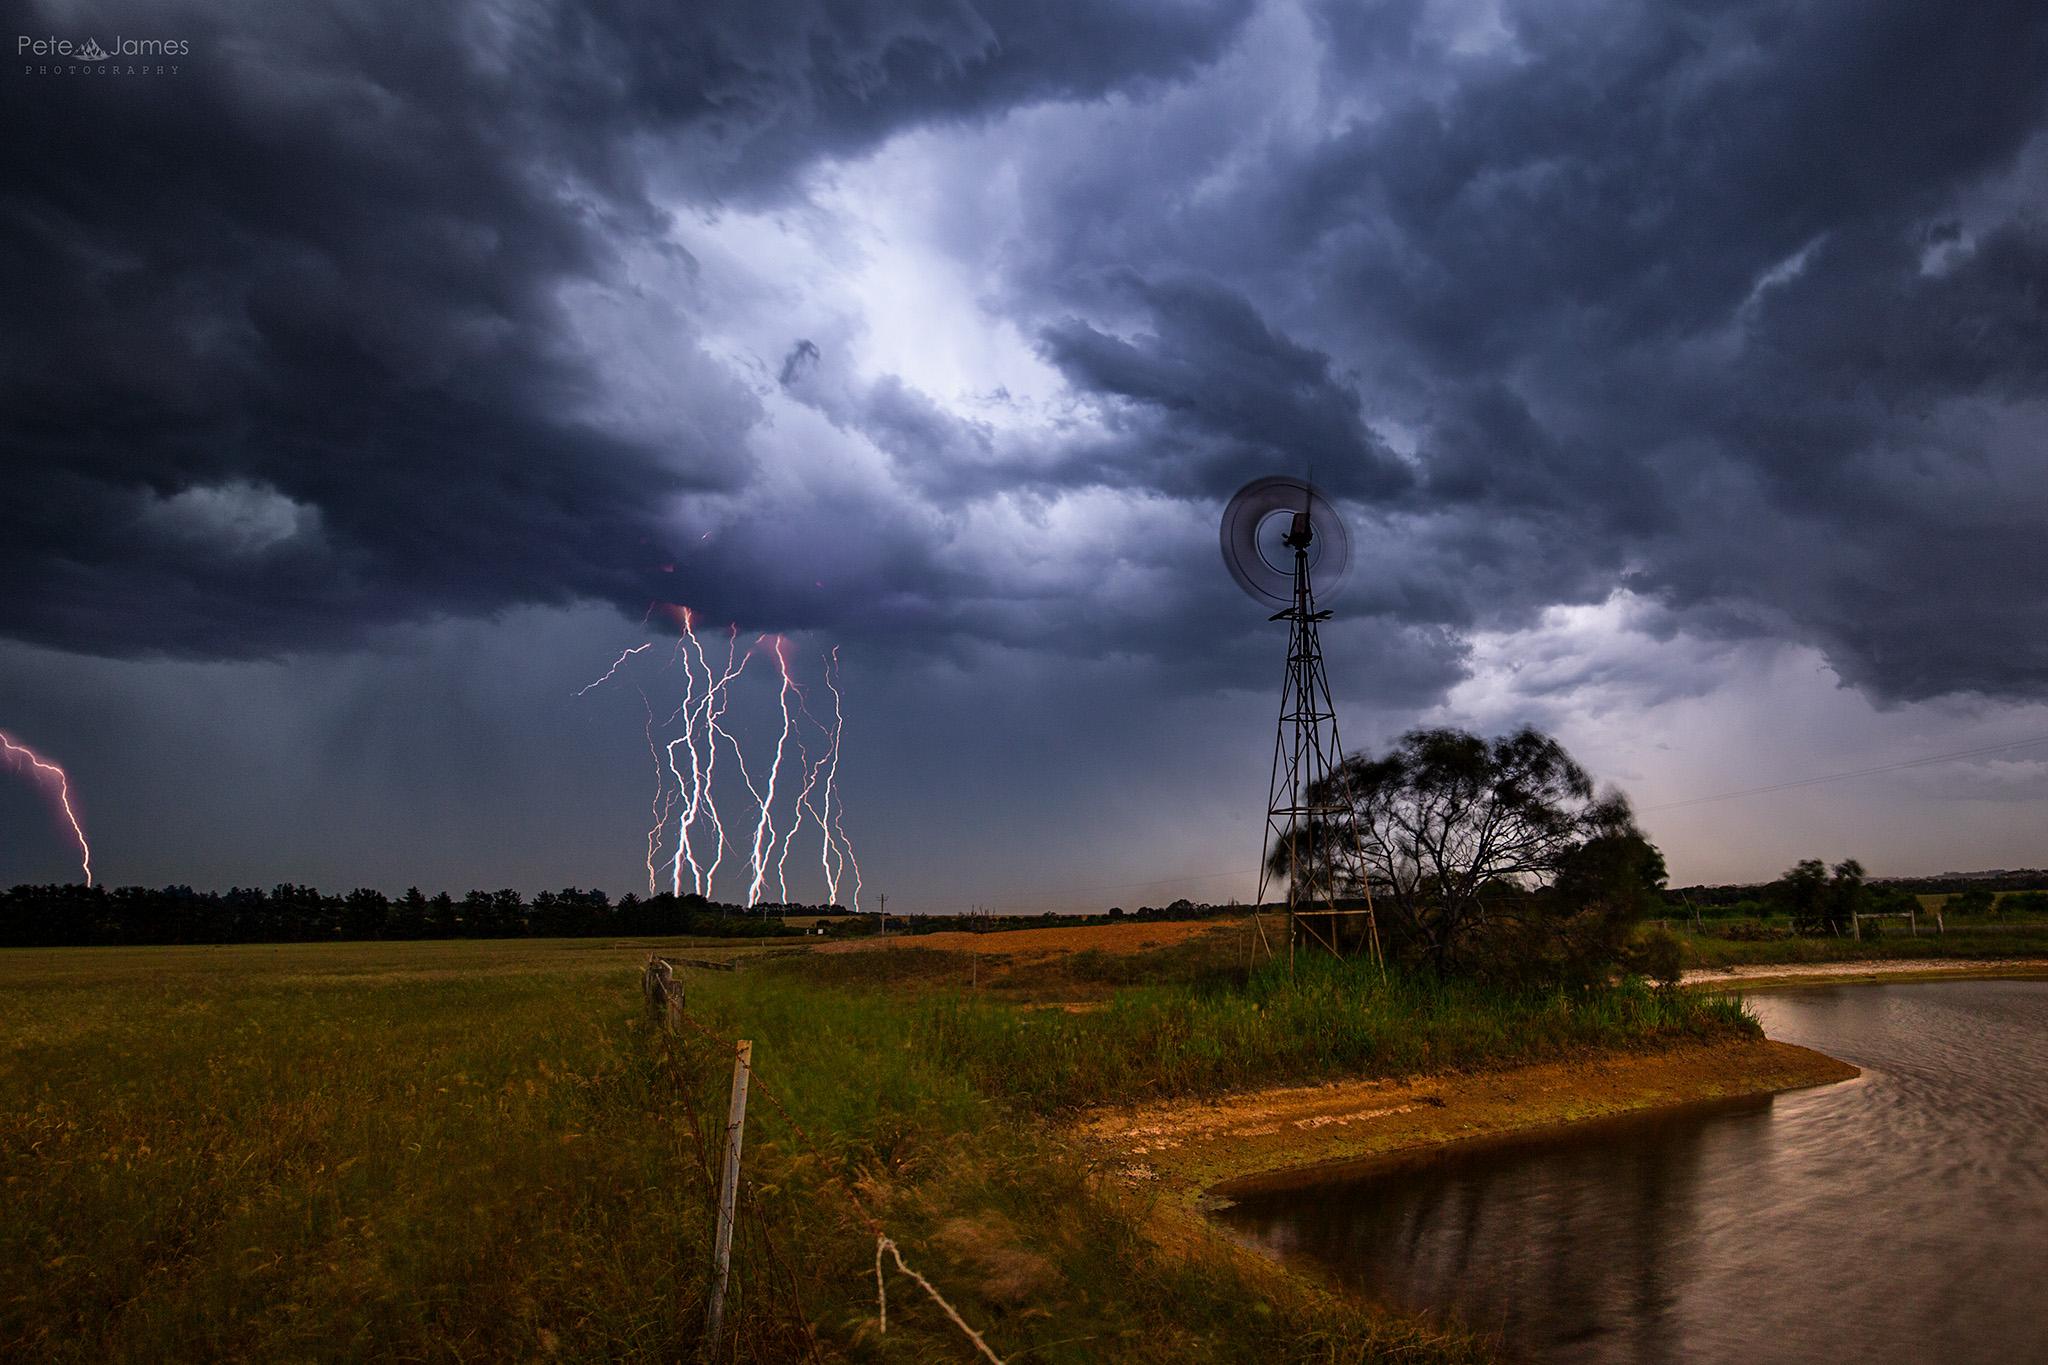 Rural lightening